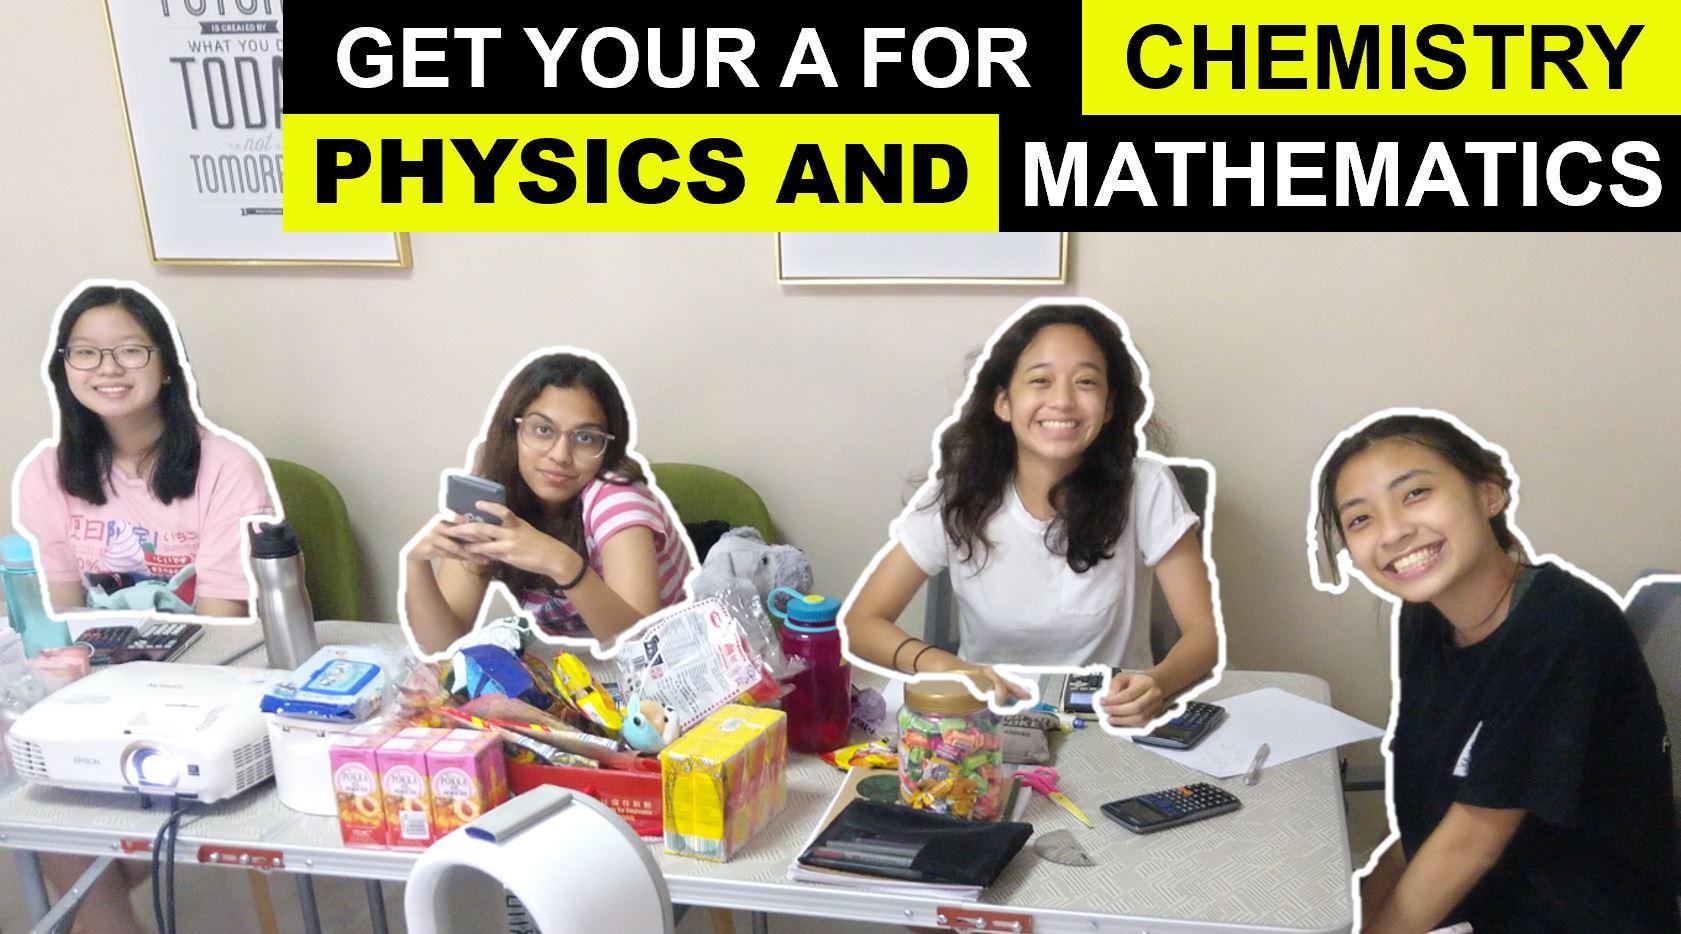 IP and O Level Chemistry, Physics and Mathematics